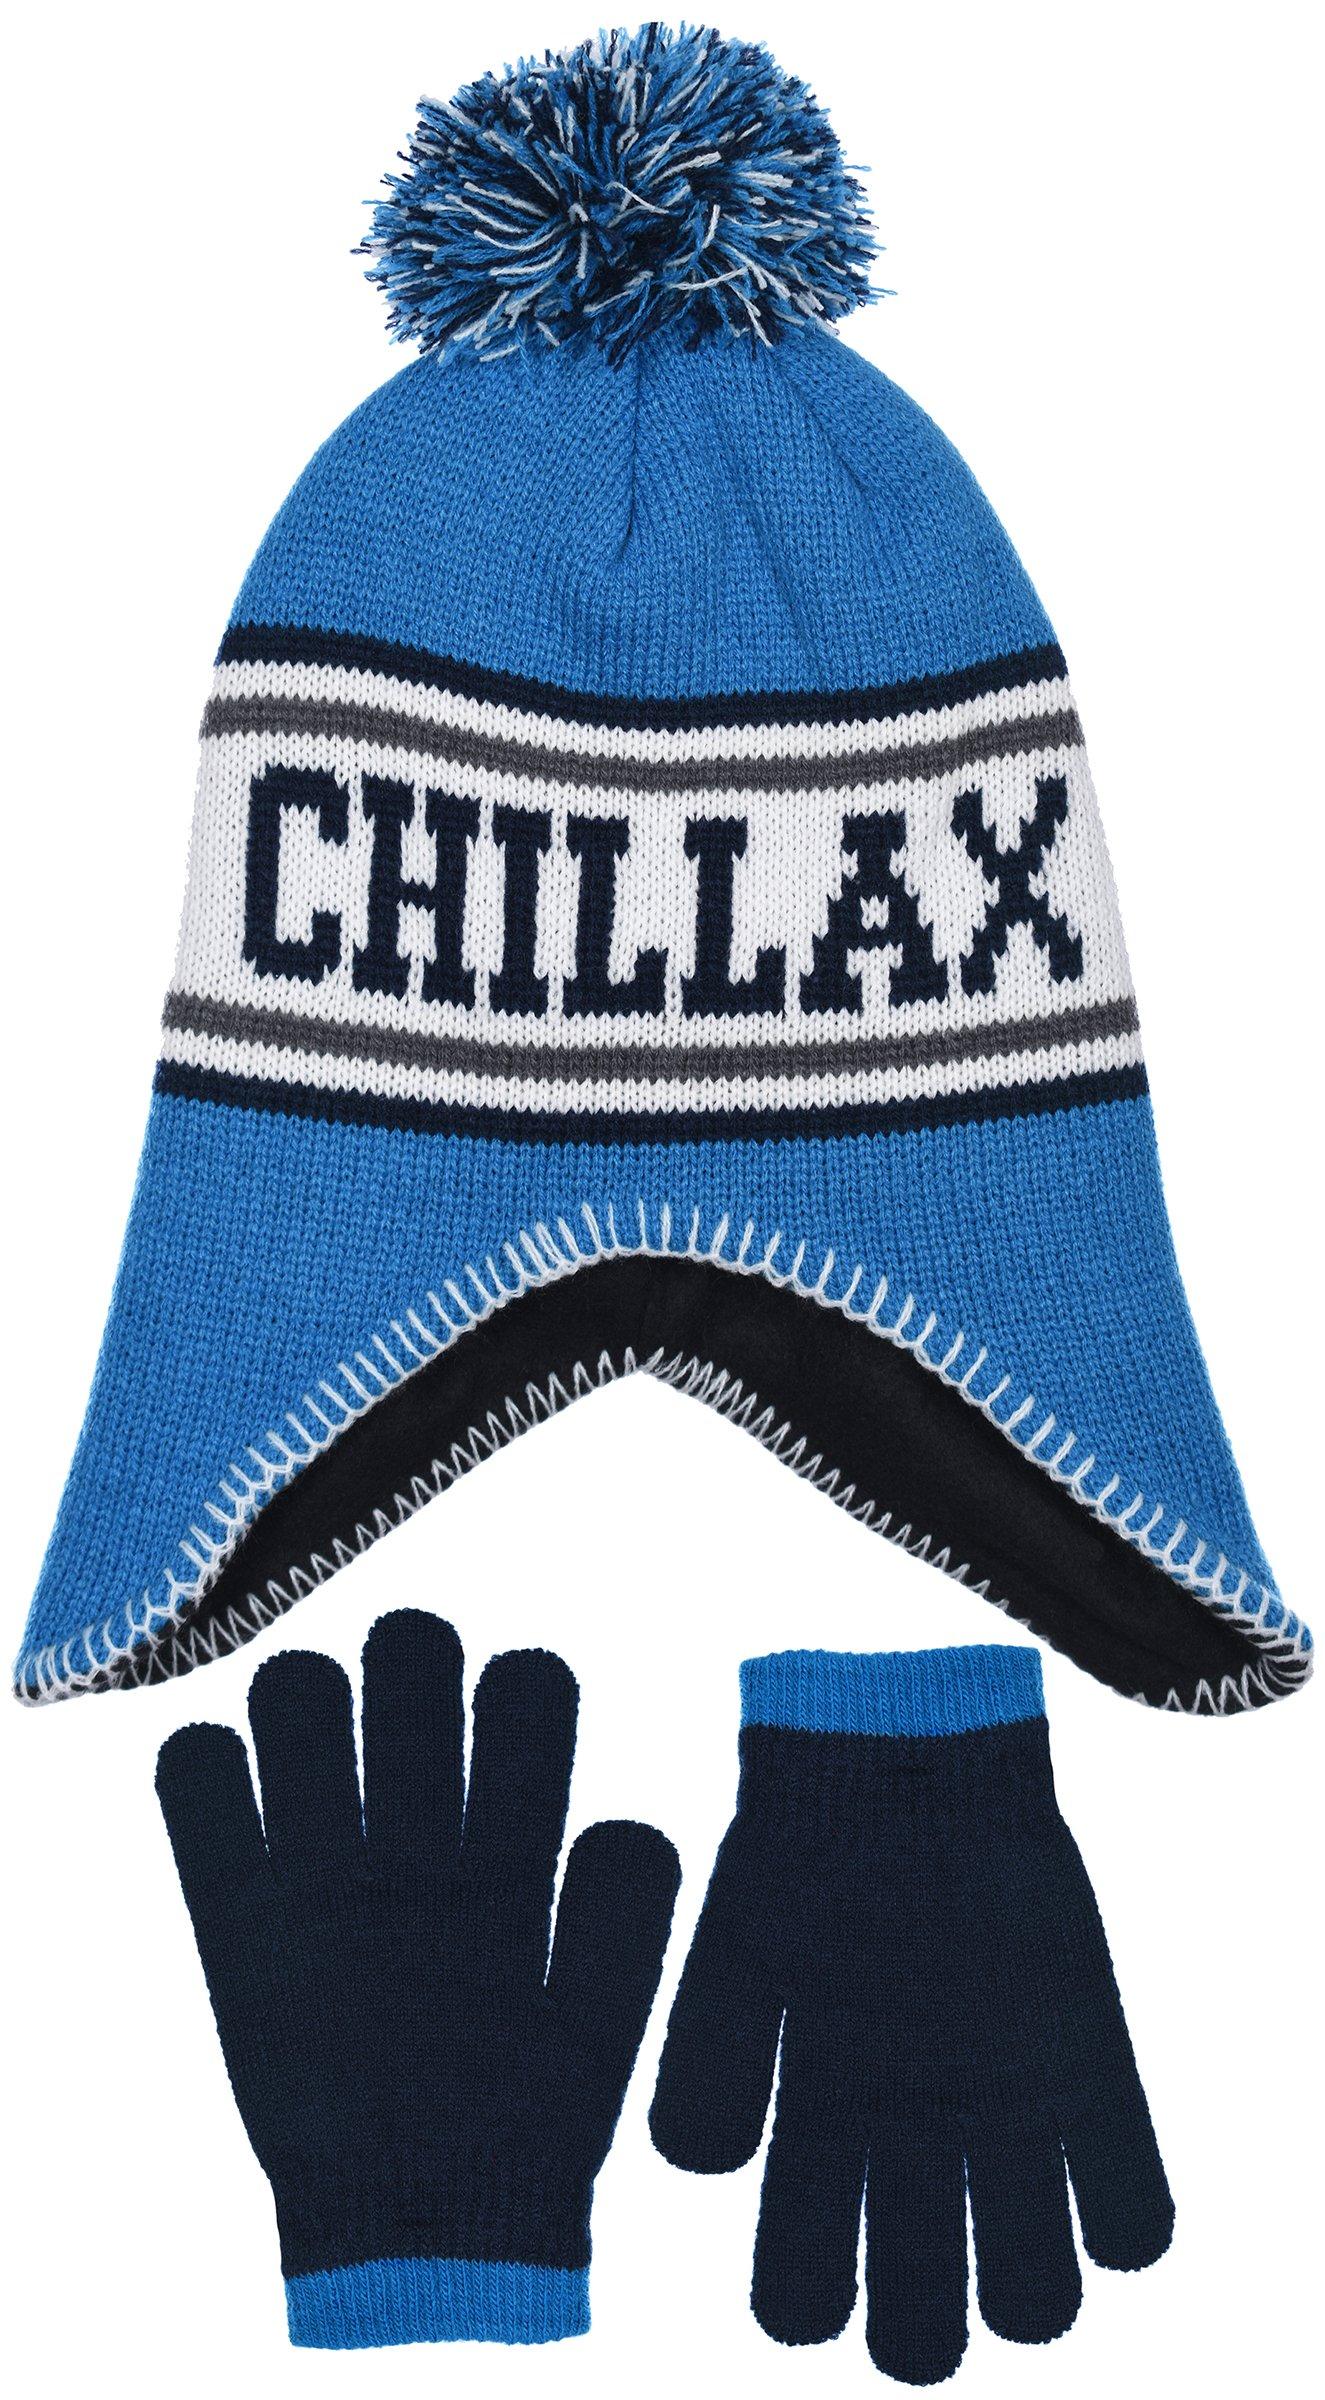 Polar Wear Boy's Knit Hat with Ear Flaps & Gloves Set in Fun Designs (CHILLAX)